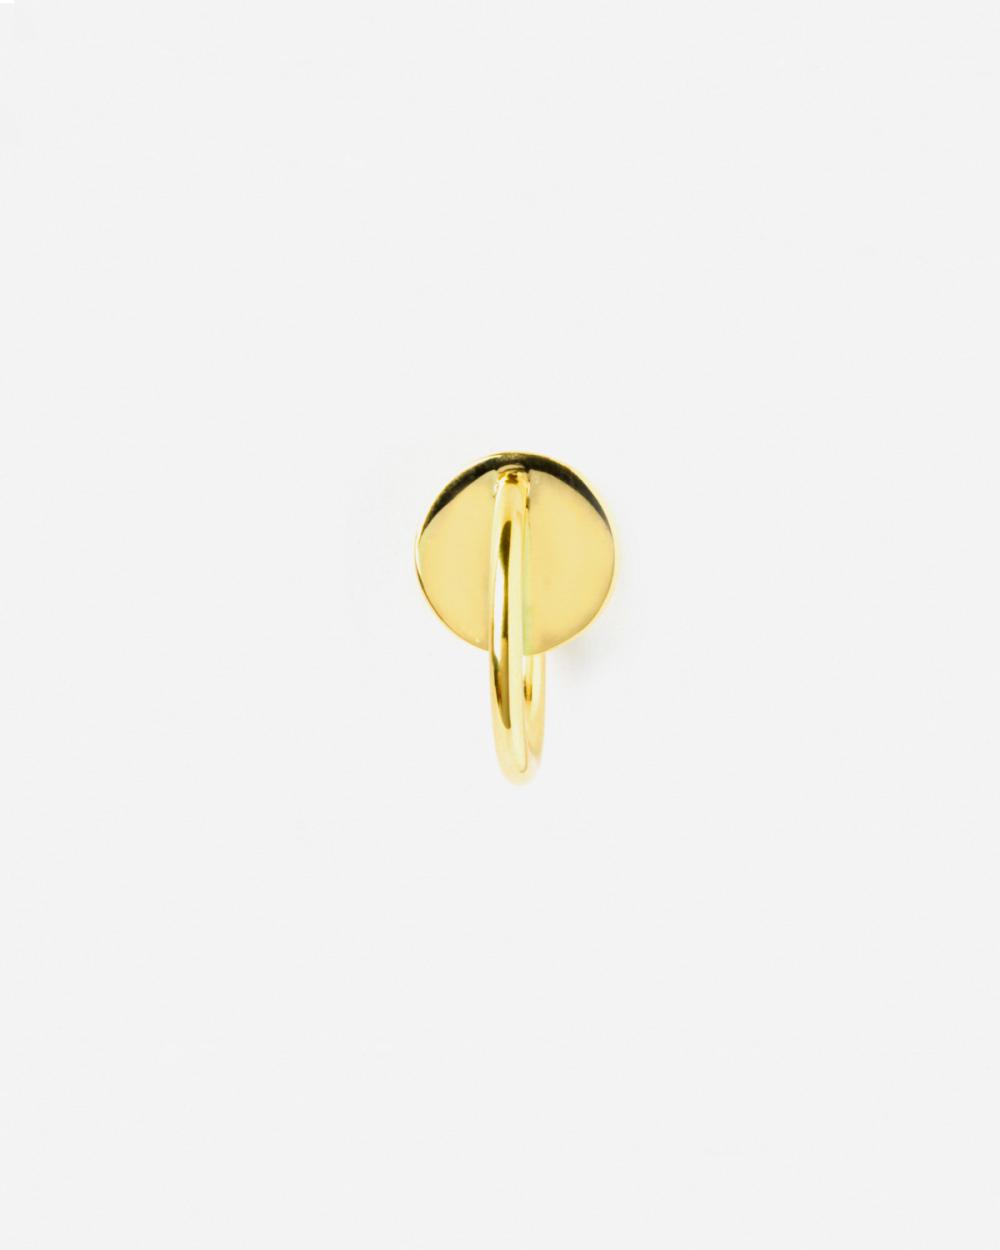 Earrings YELLOW GOLD SIGMA SINGLE EARRING NOVE25